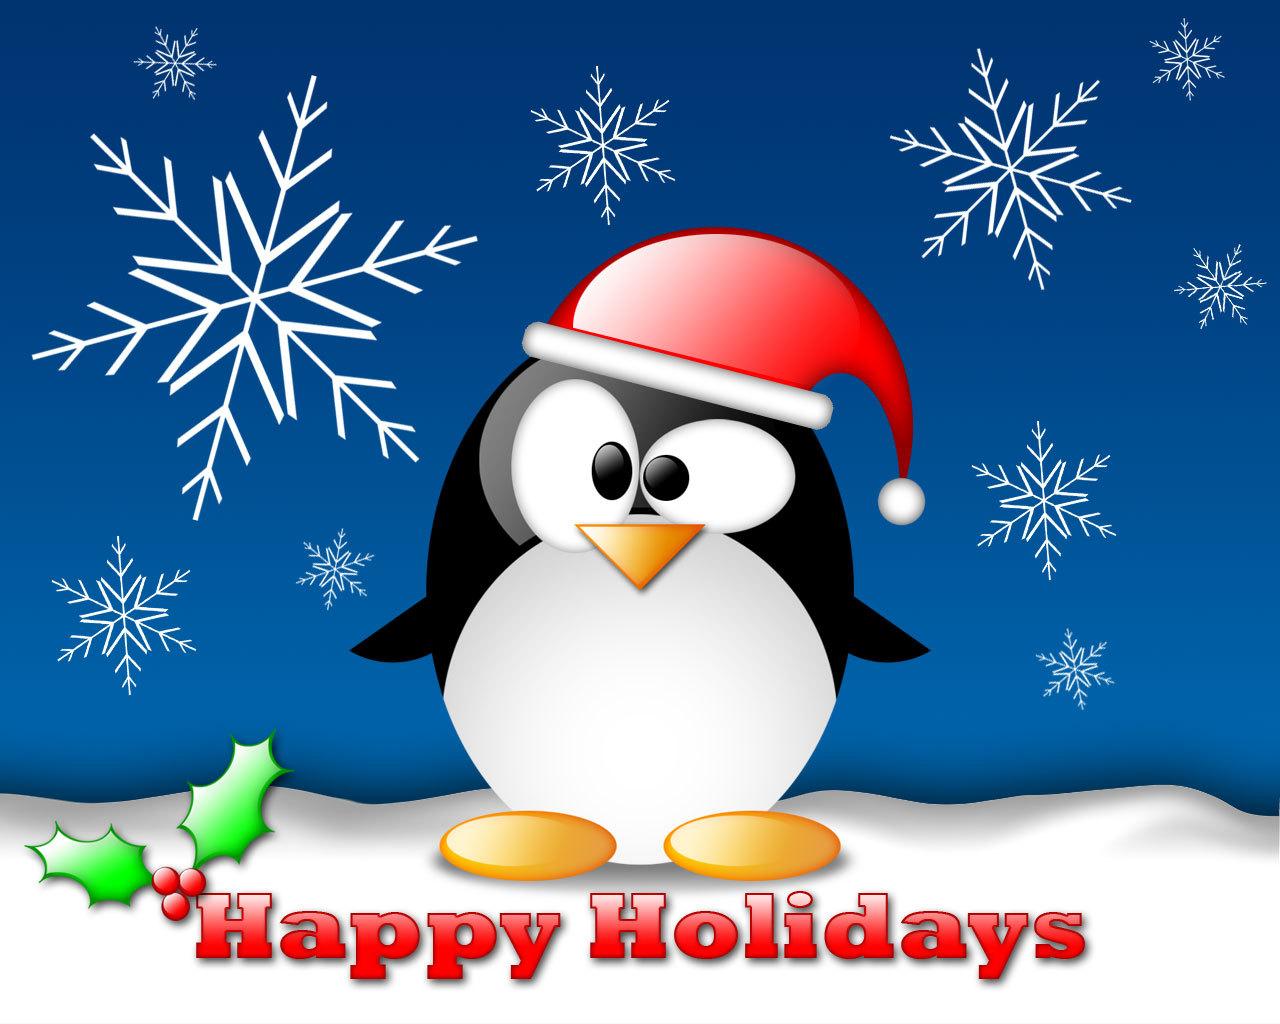 Merry Christmas - Christmas Wallpaper (465664) - Fanpop